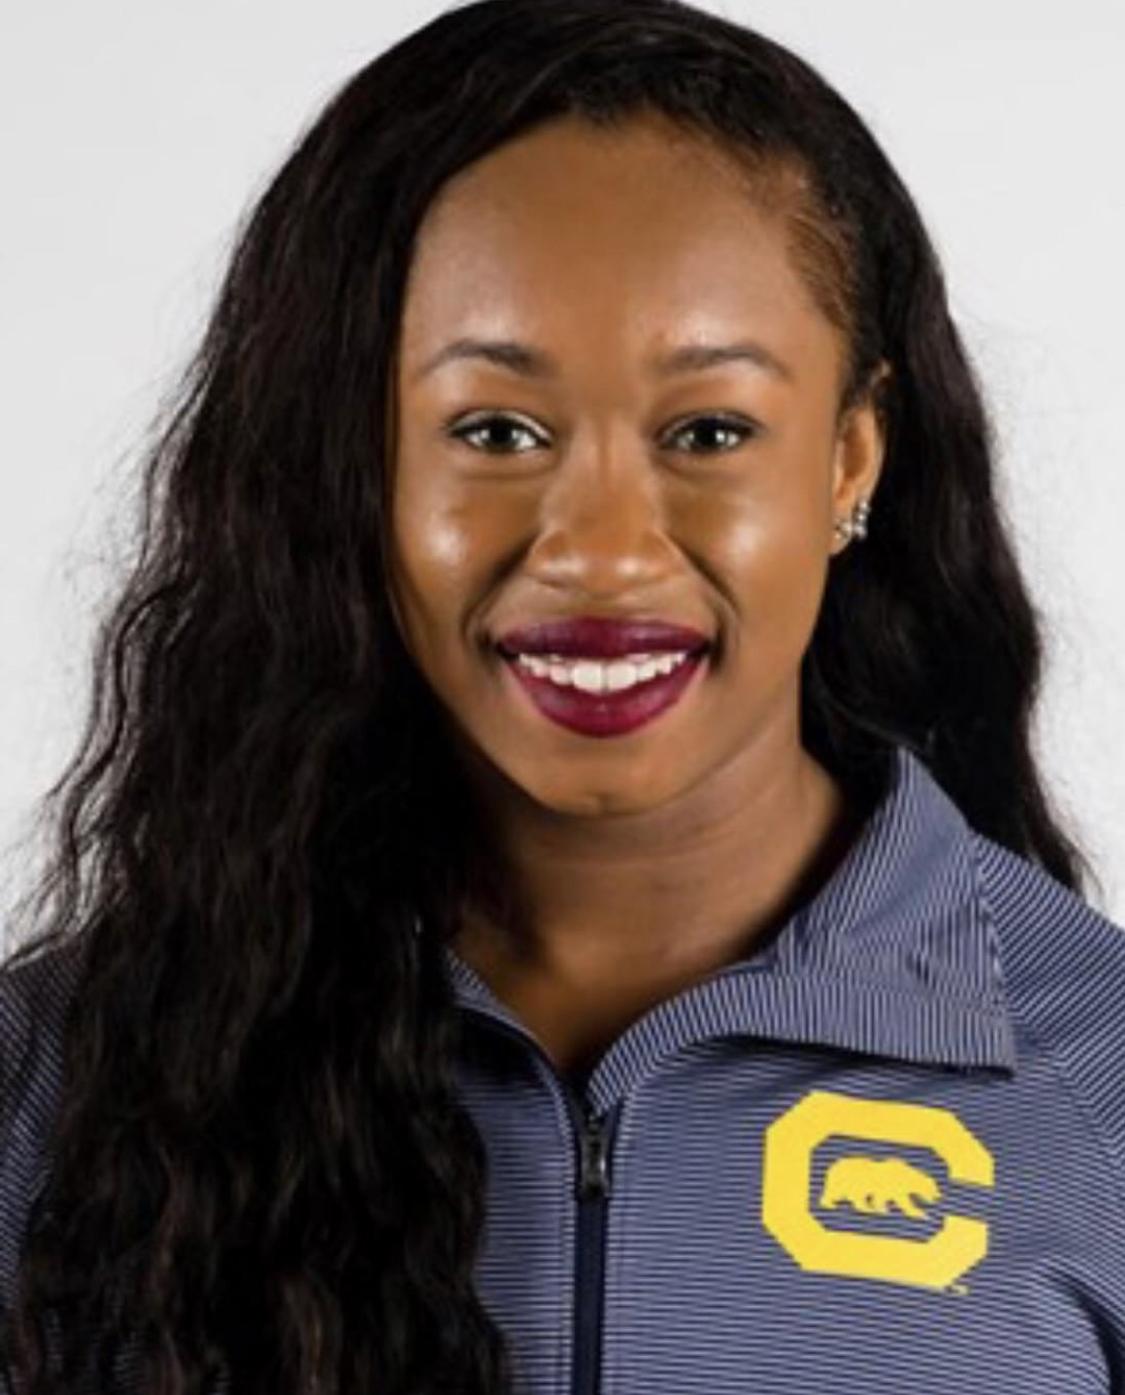 Toni-Ann Williams - 2016 Olympian and UC Berkeley